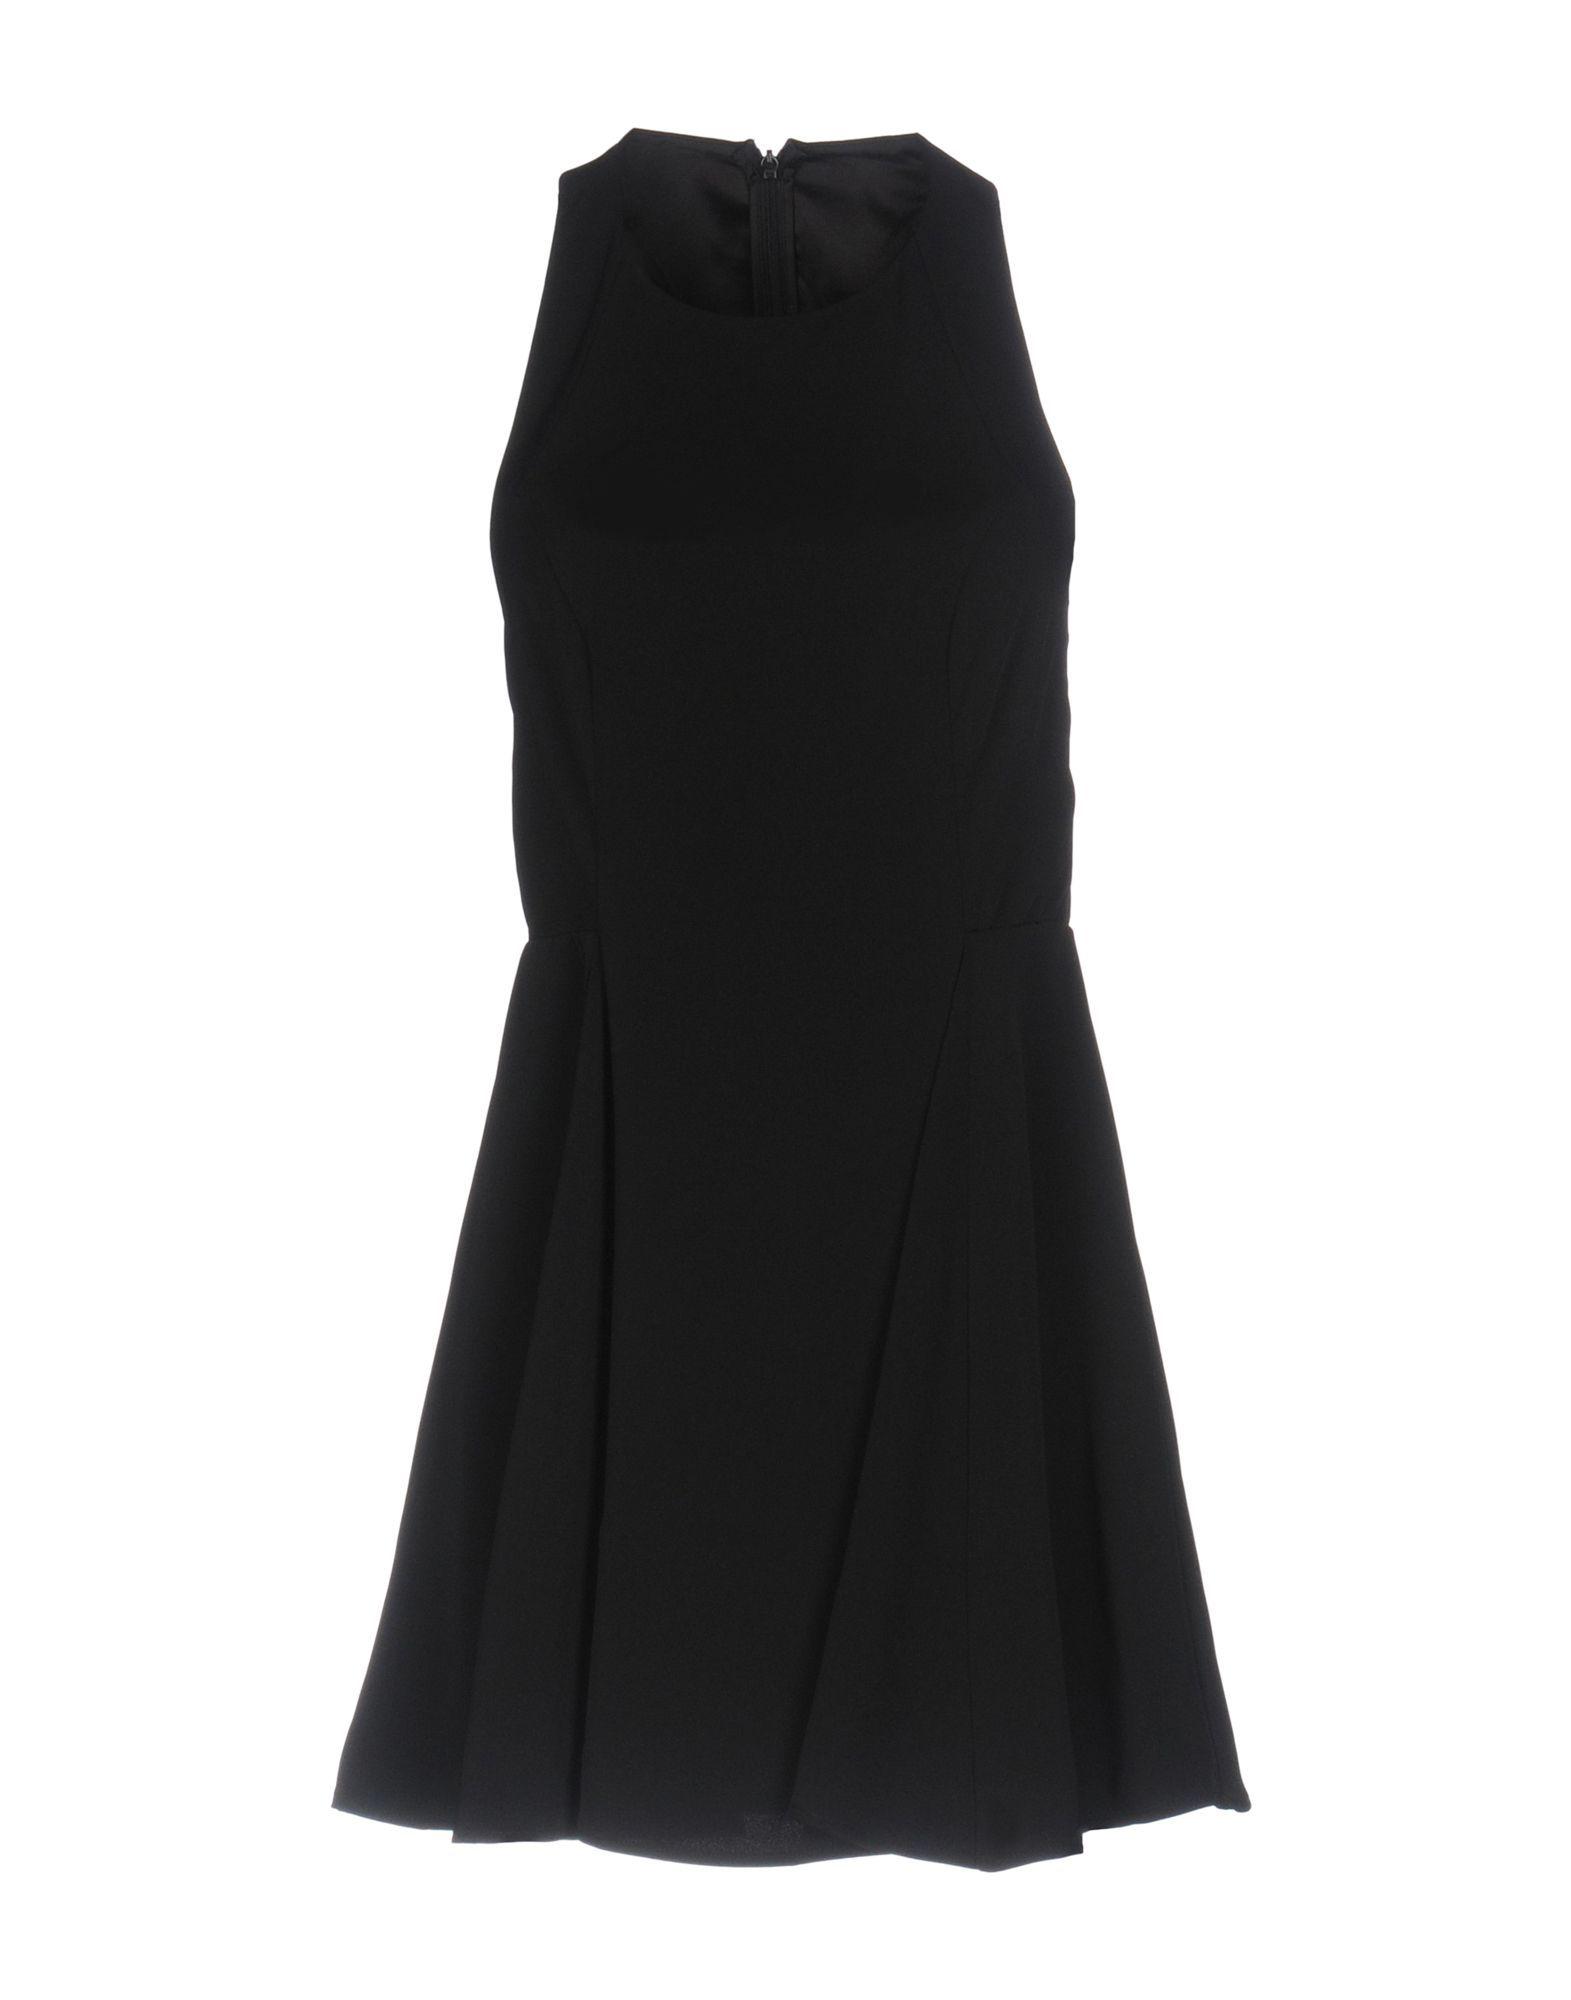 Finders Keepers Black Crepe Sleeveless Dress